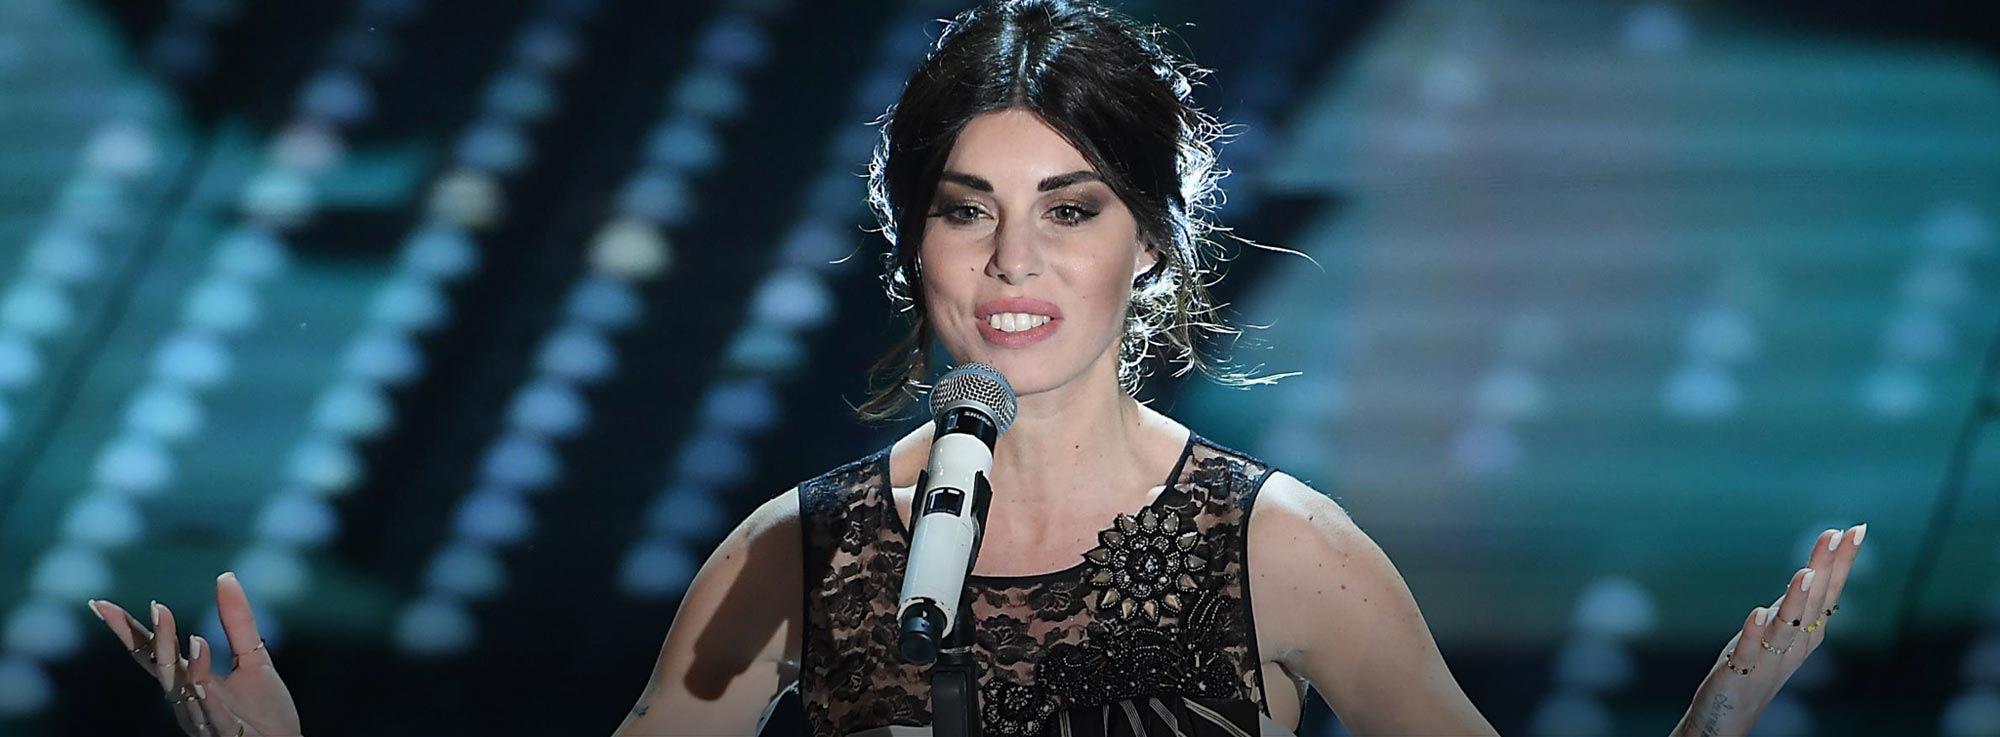 Gravina di Puglia: Bianca Atzei in concerto